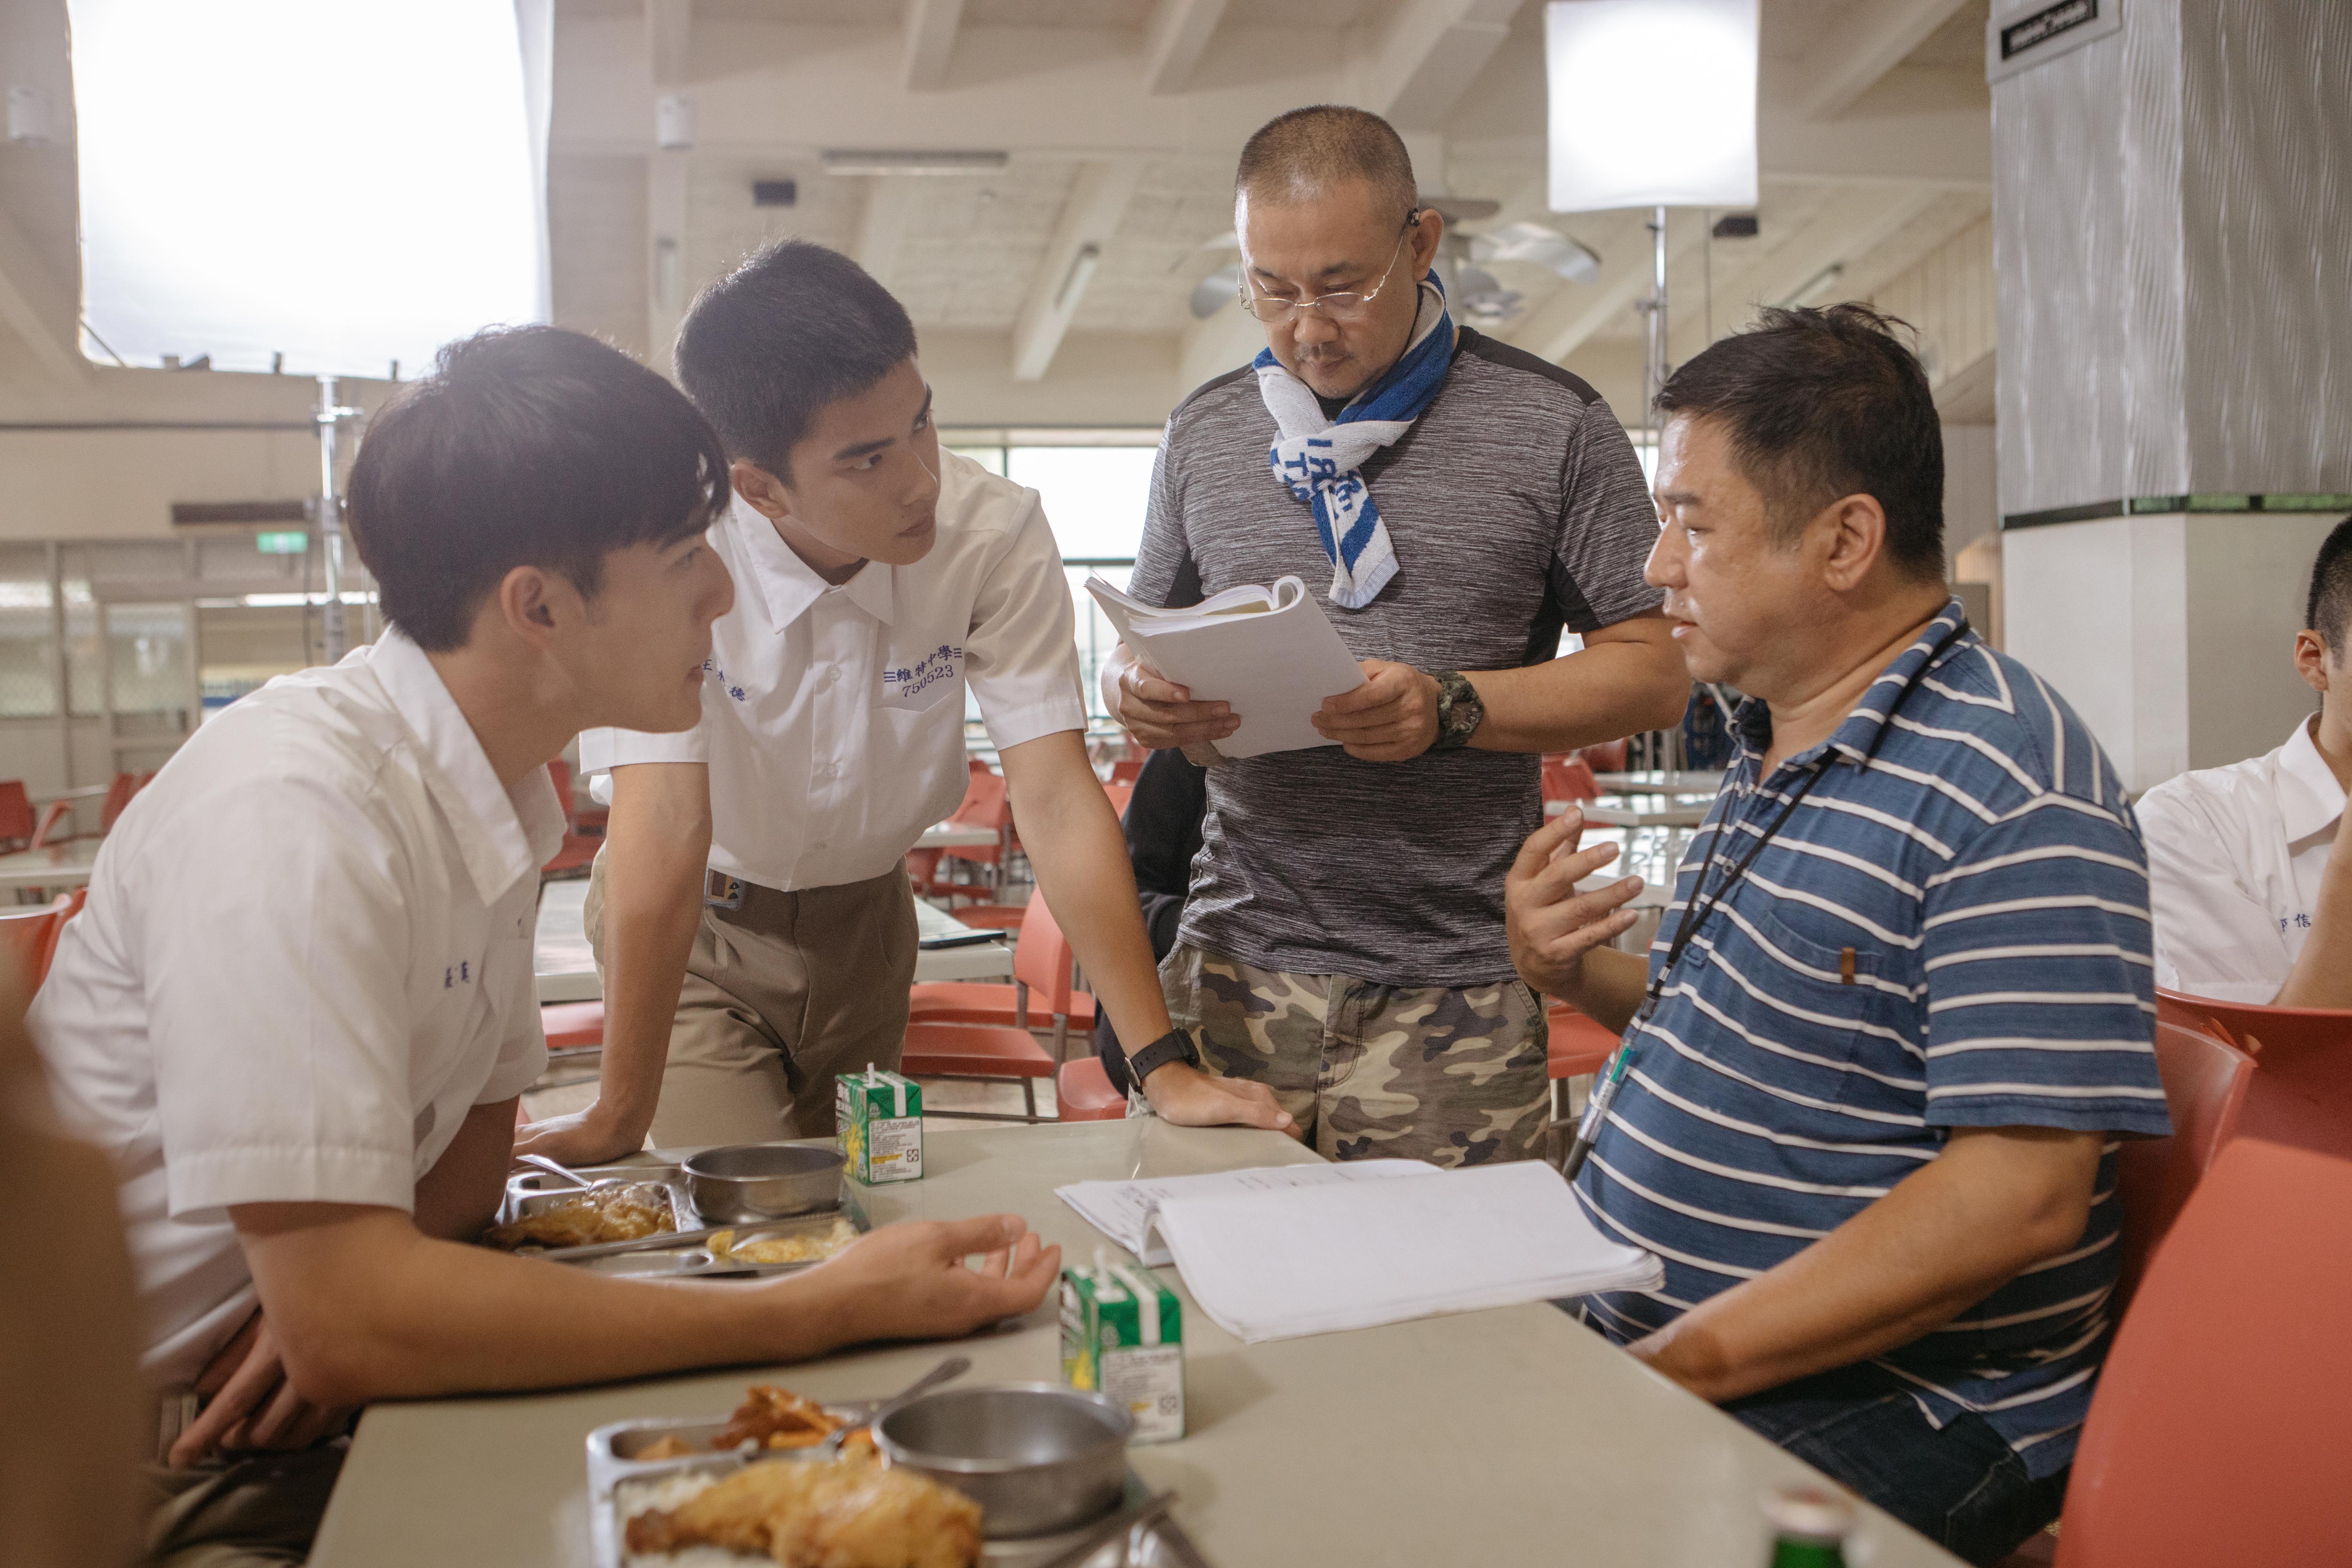 From left to right: Edward Chen, Jing-Hua Tseng, Patrick Liu, Arthur Chu